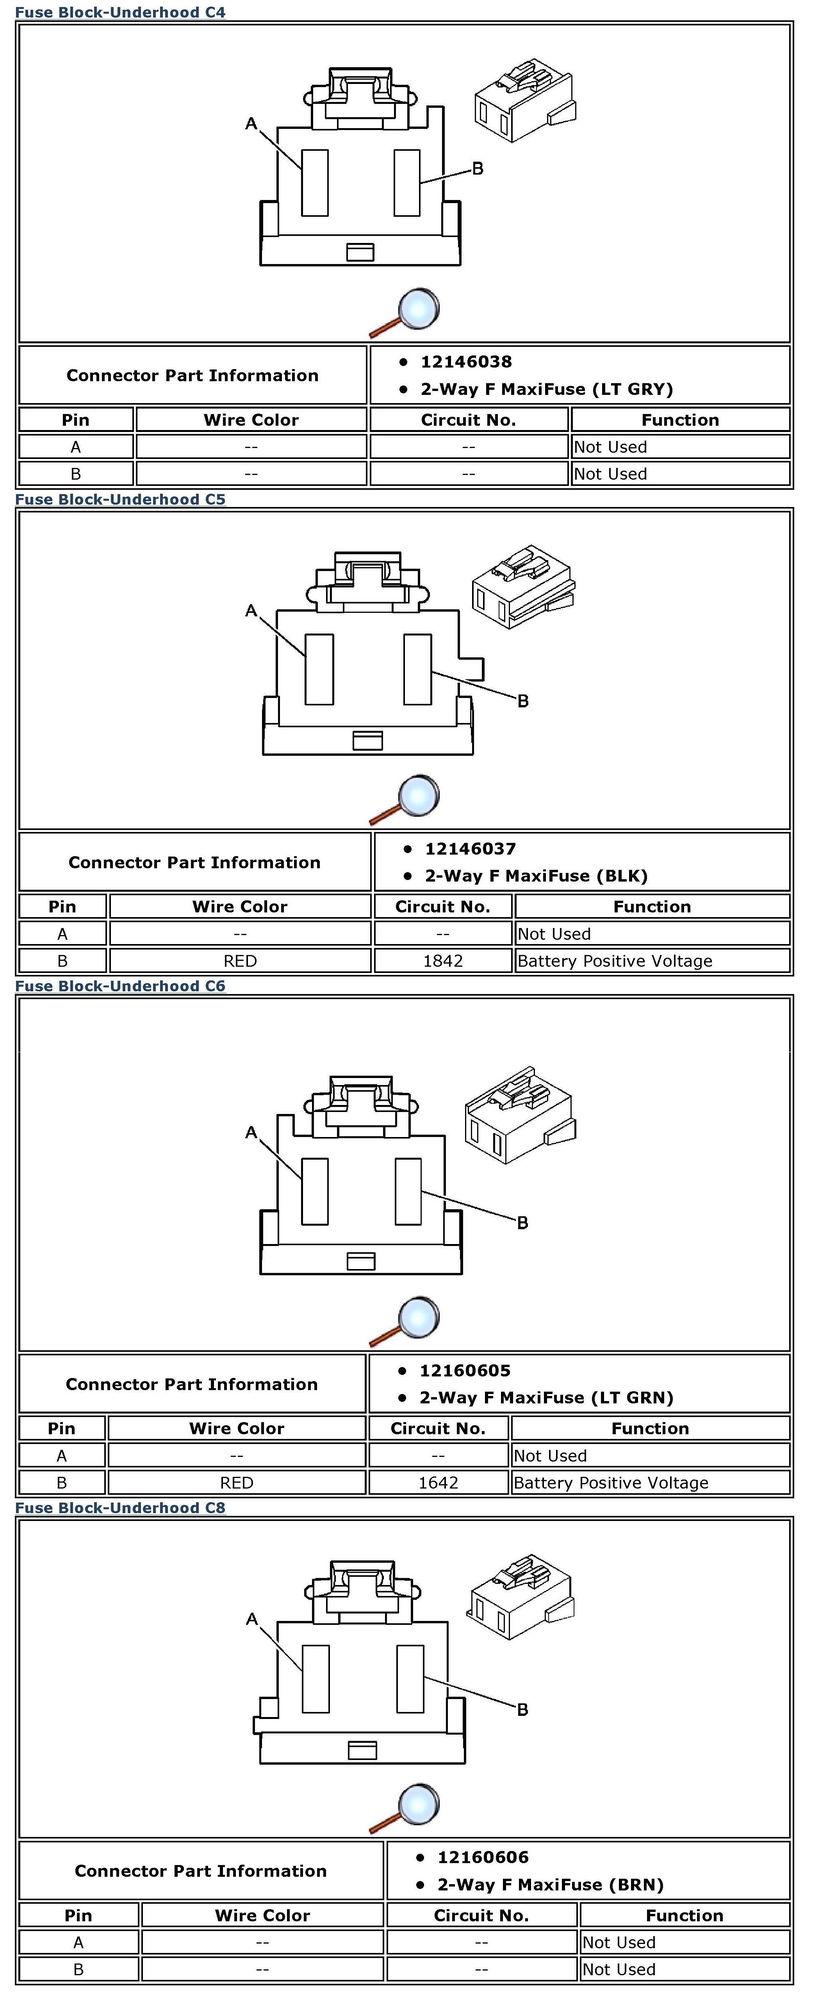 Under Hood Fusebox Wiring Issue Page 2 Corvetteforum Chevrolet C6 Fuse Diagram Underhood Connector C4 C8